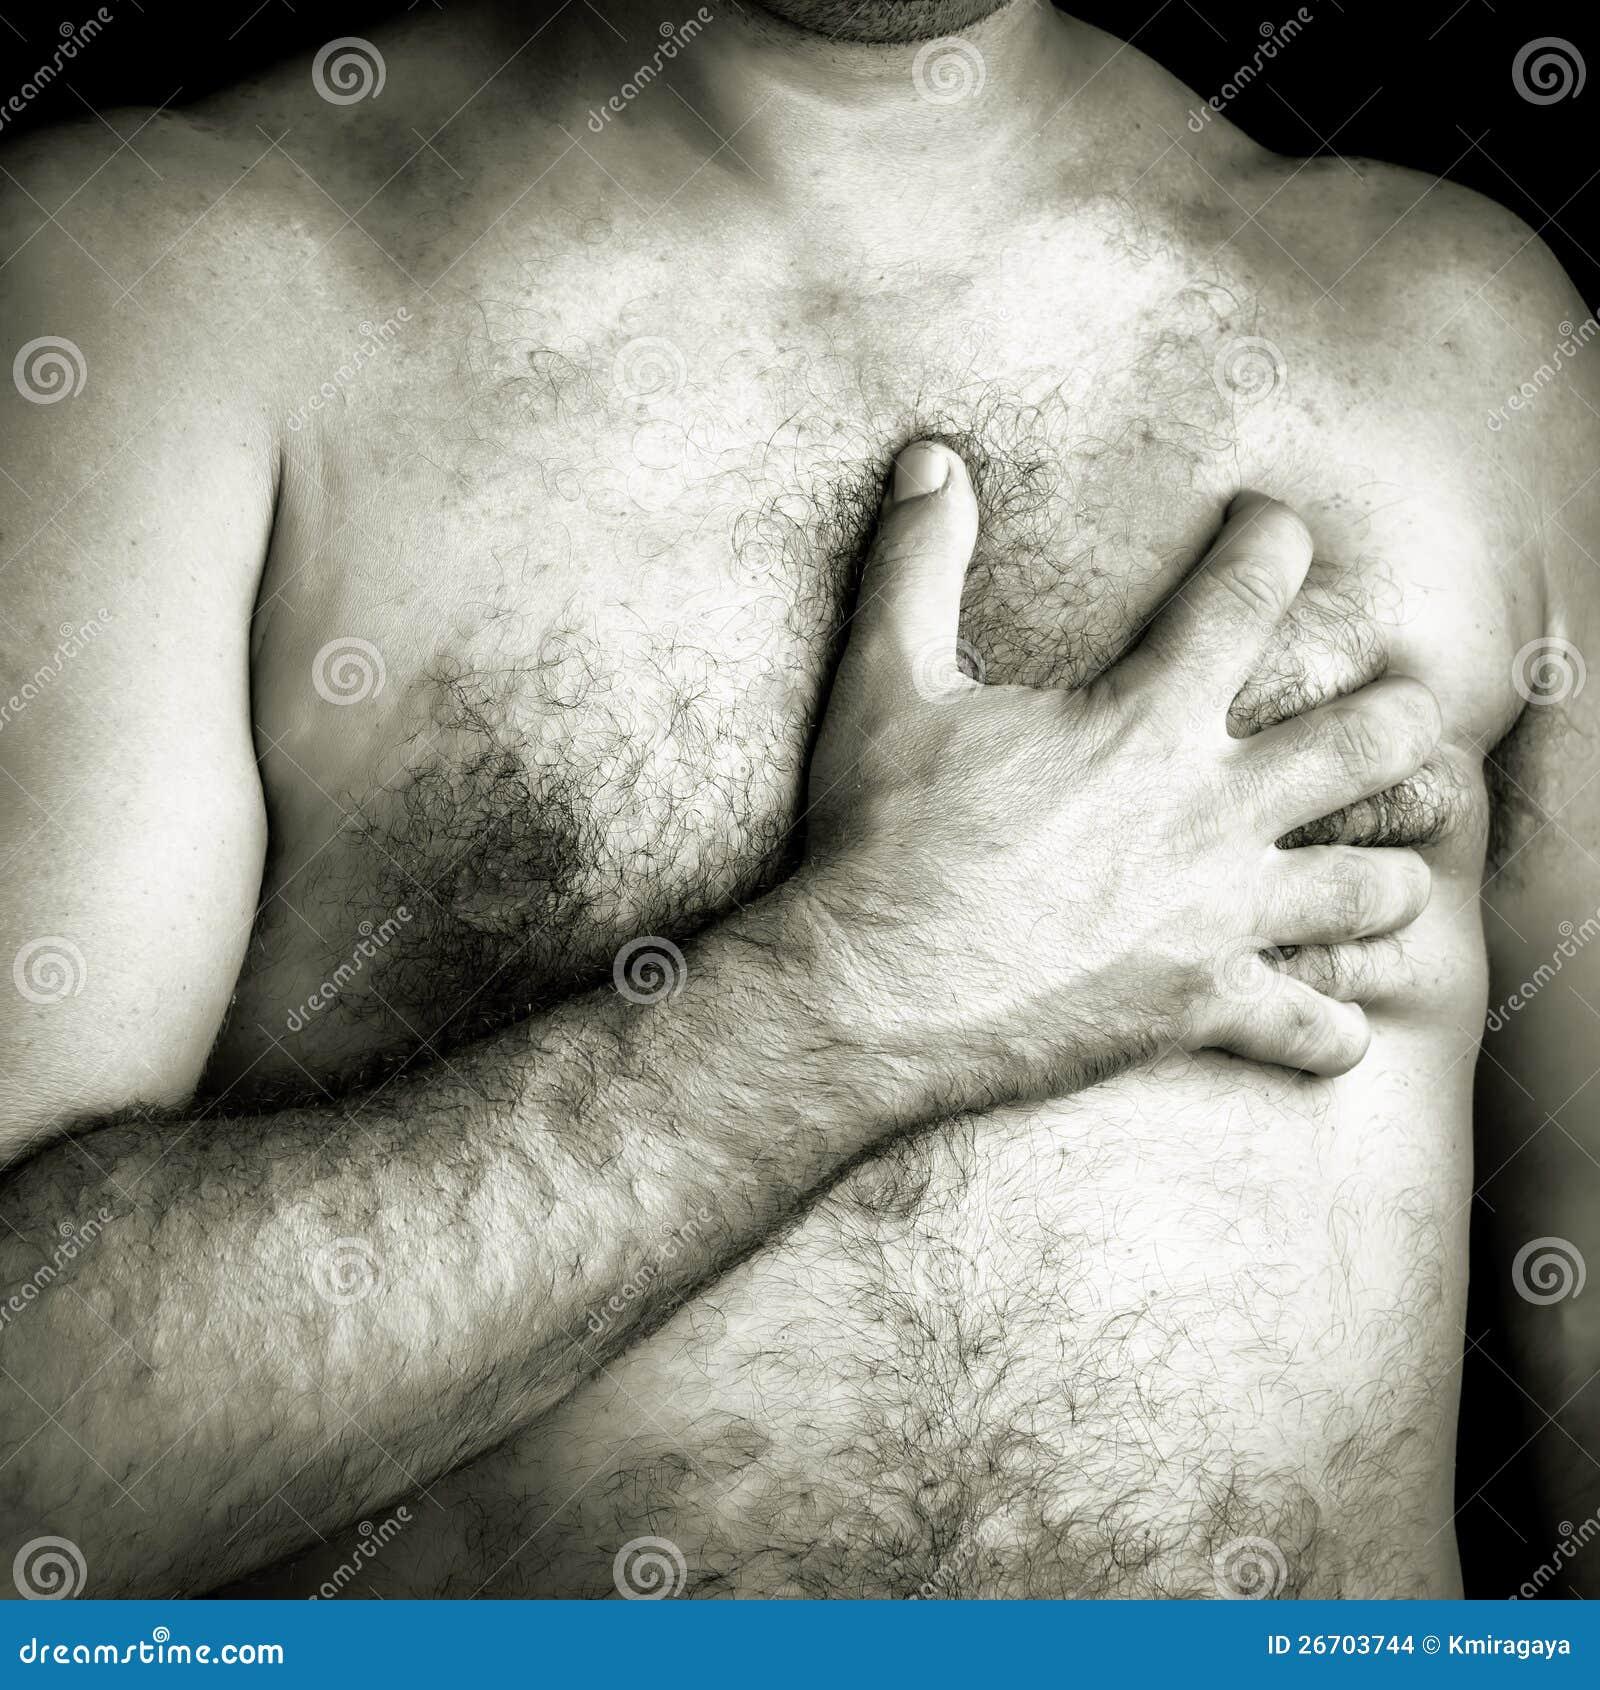 Consider, breast pain in men